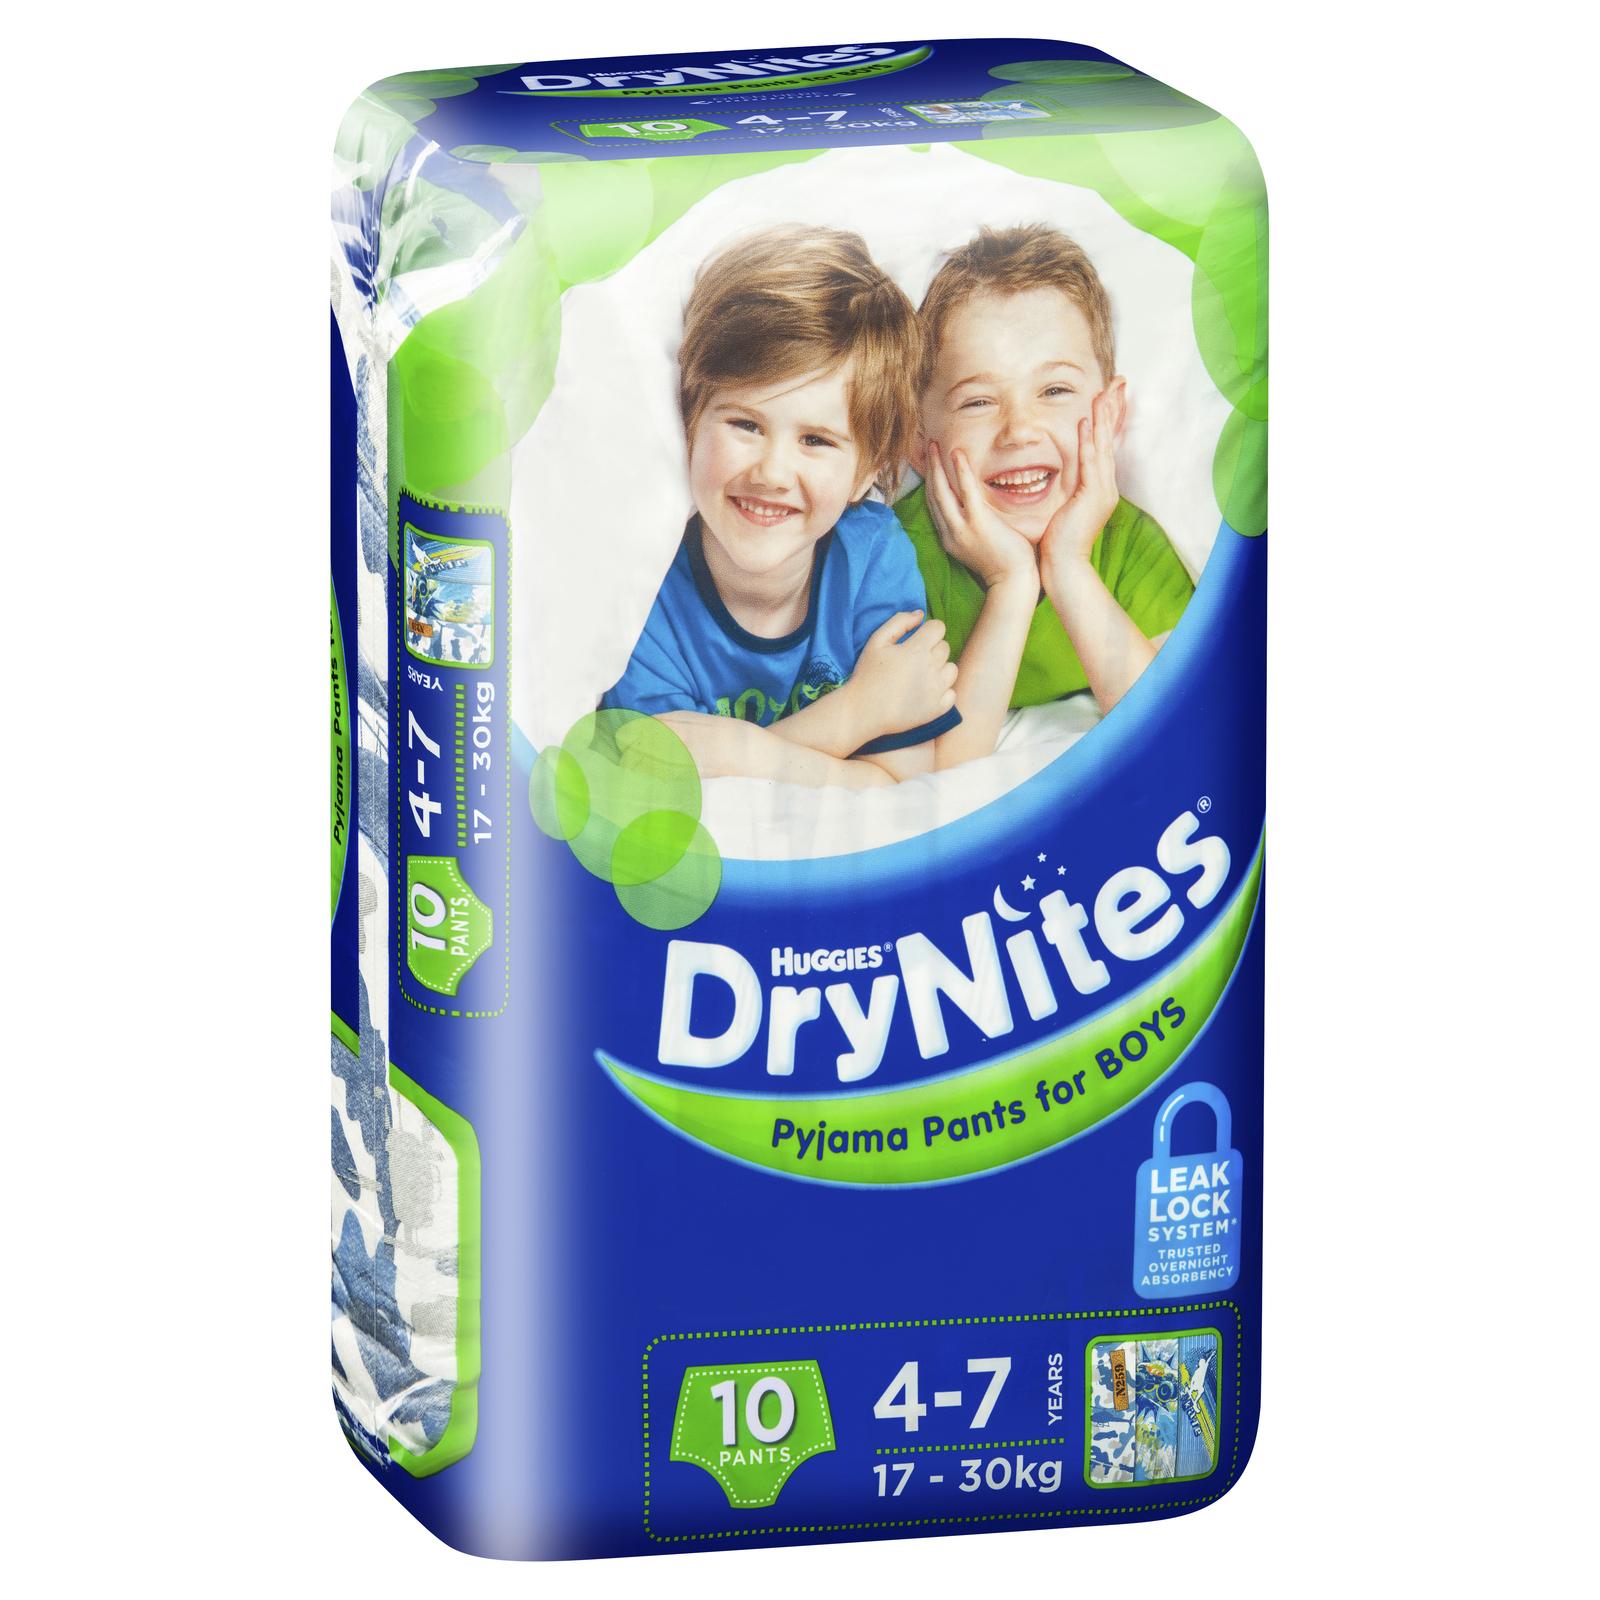 Huggies DryNites Pyjama Pants - 4-7 Year Boy 17-30kg (10) image